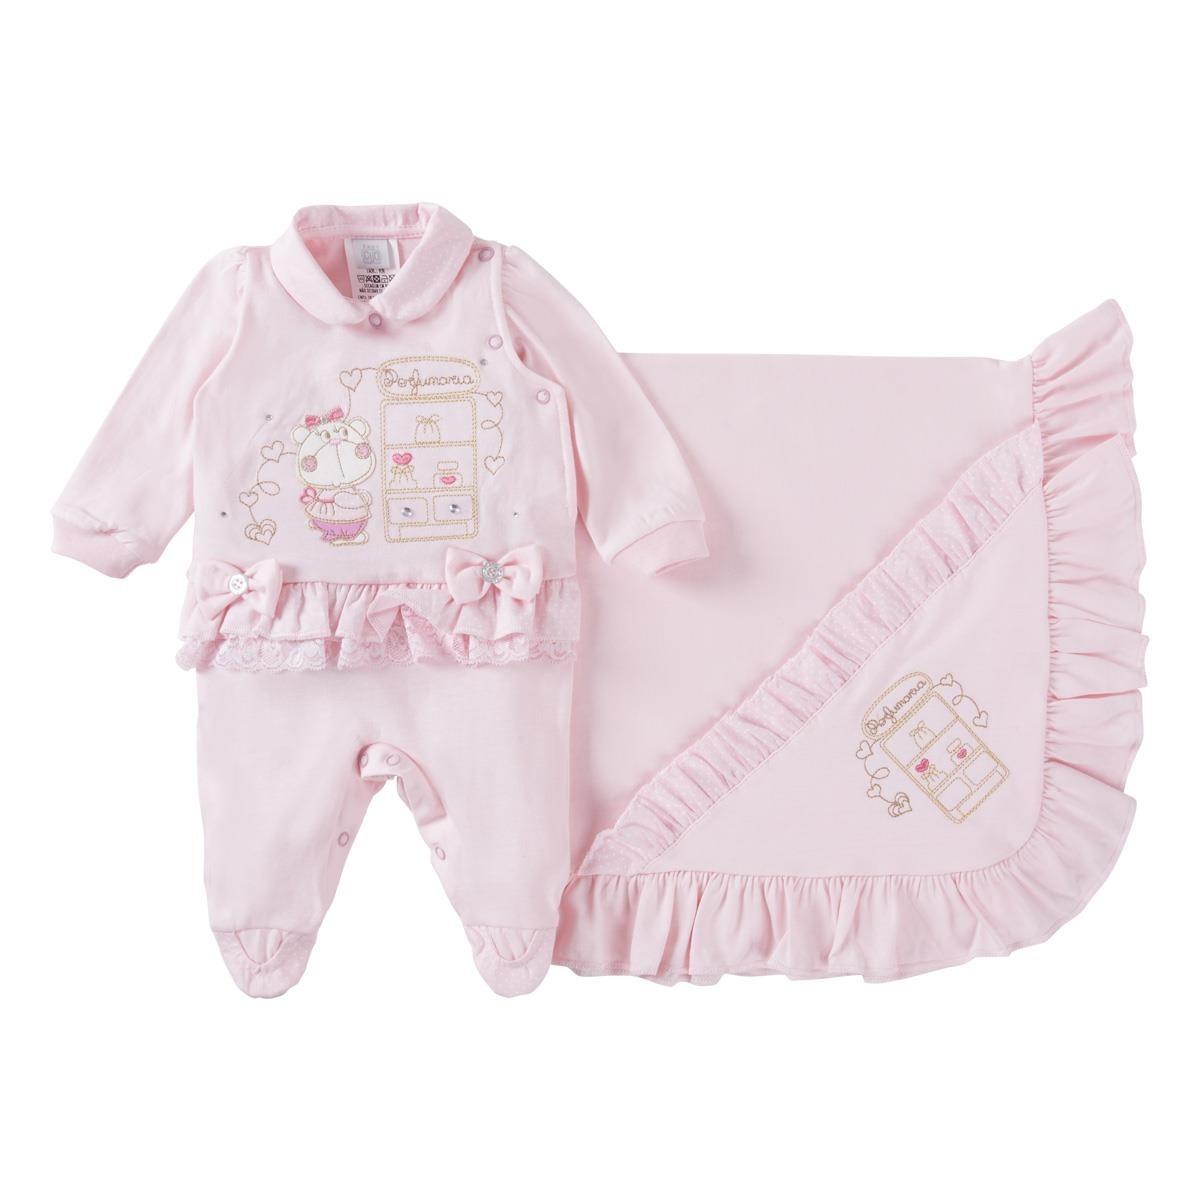 341cada034 kit saída maternidade bebe menina luxo renda frete grátis. Carregando zoom.